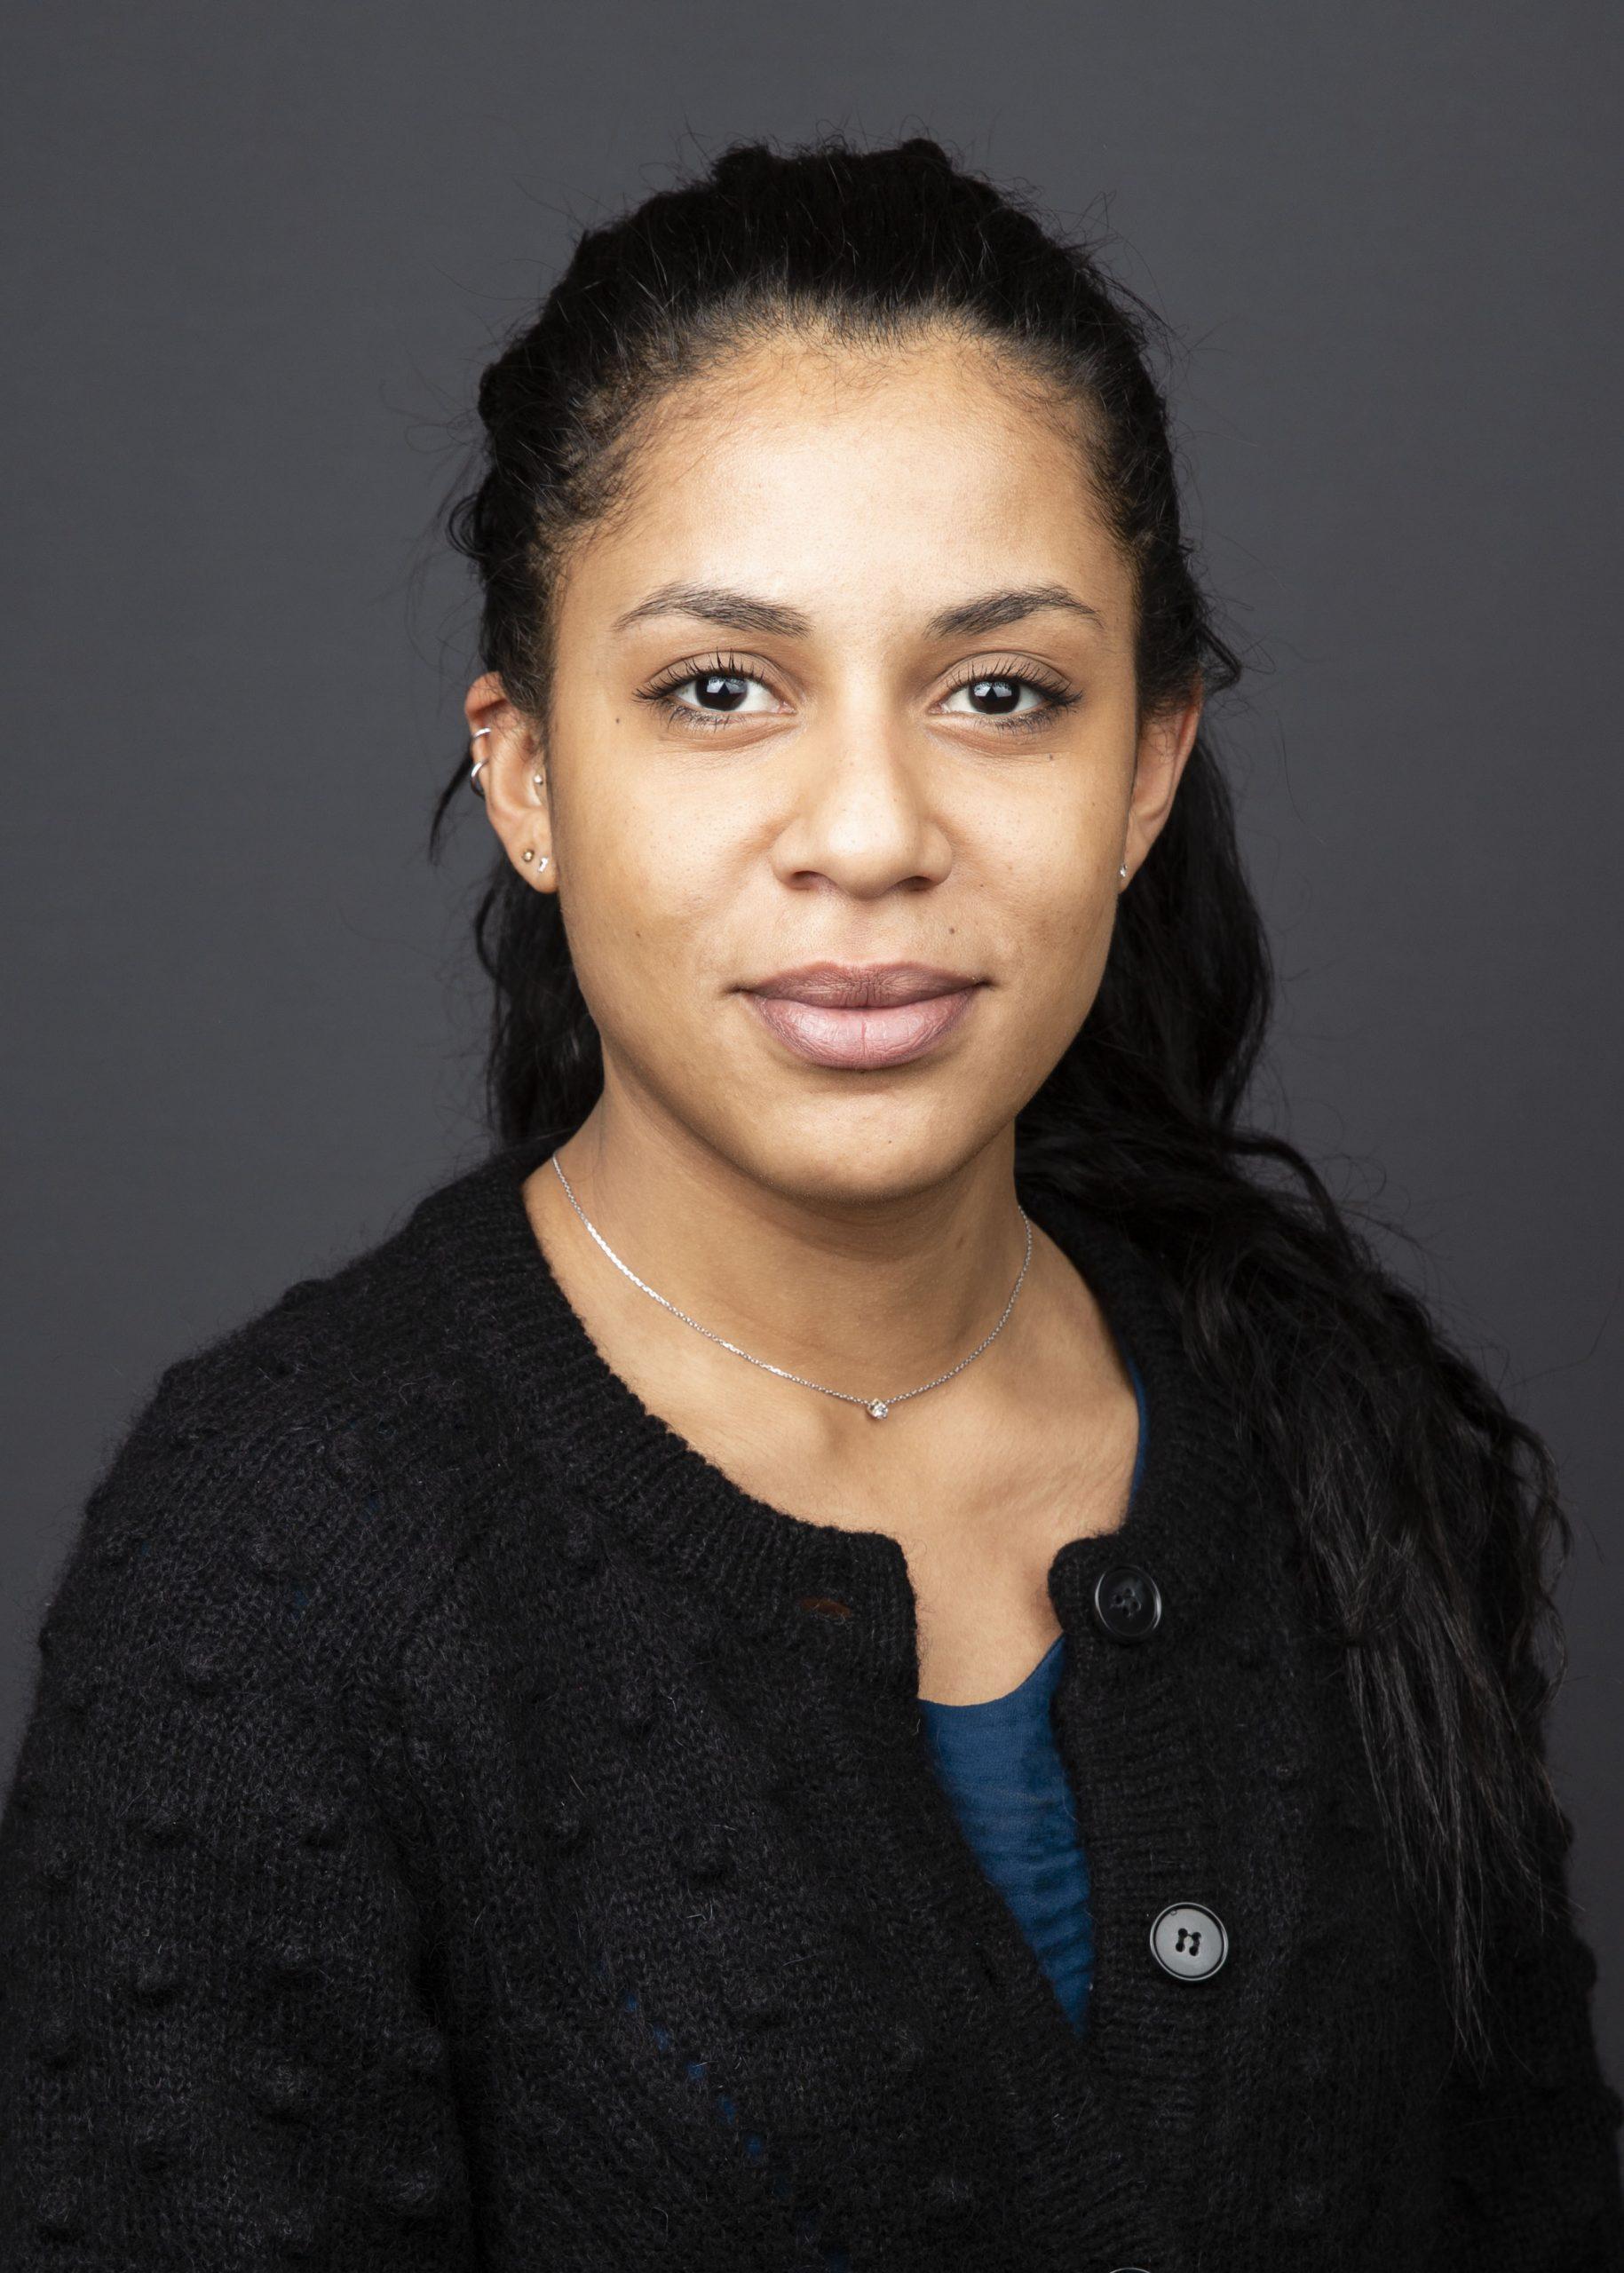 Portraits Expertisefrance Cnilsdotter Nov19 Hd (6)